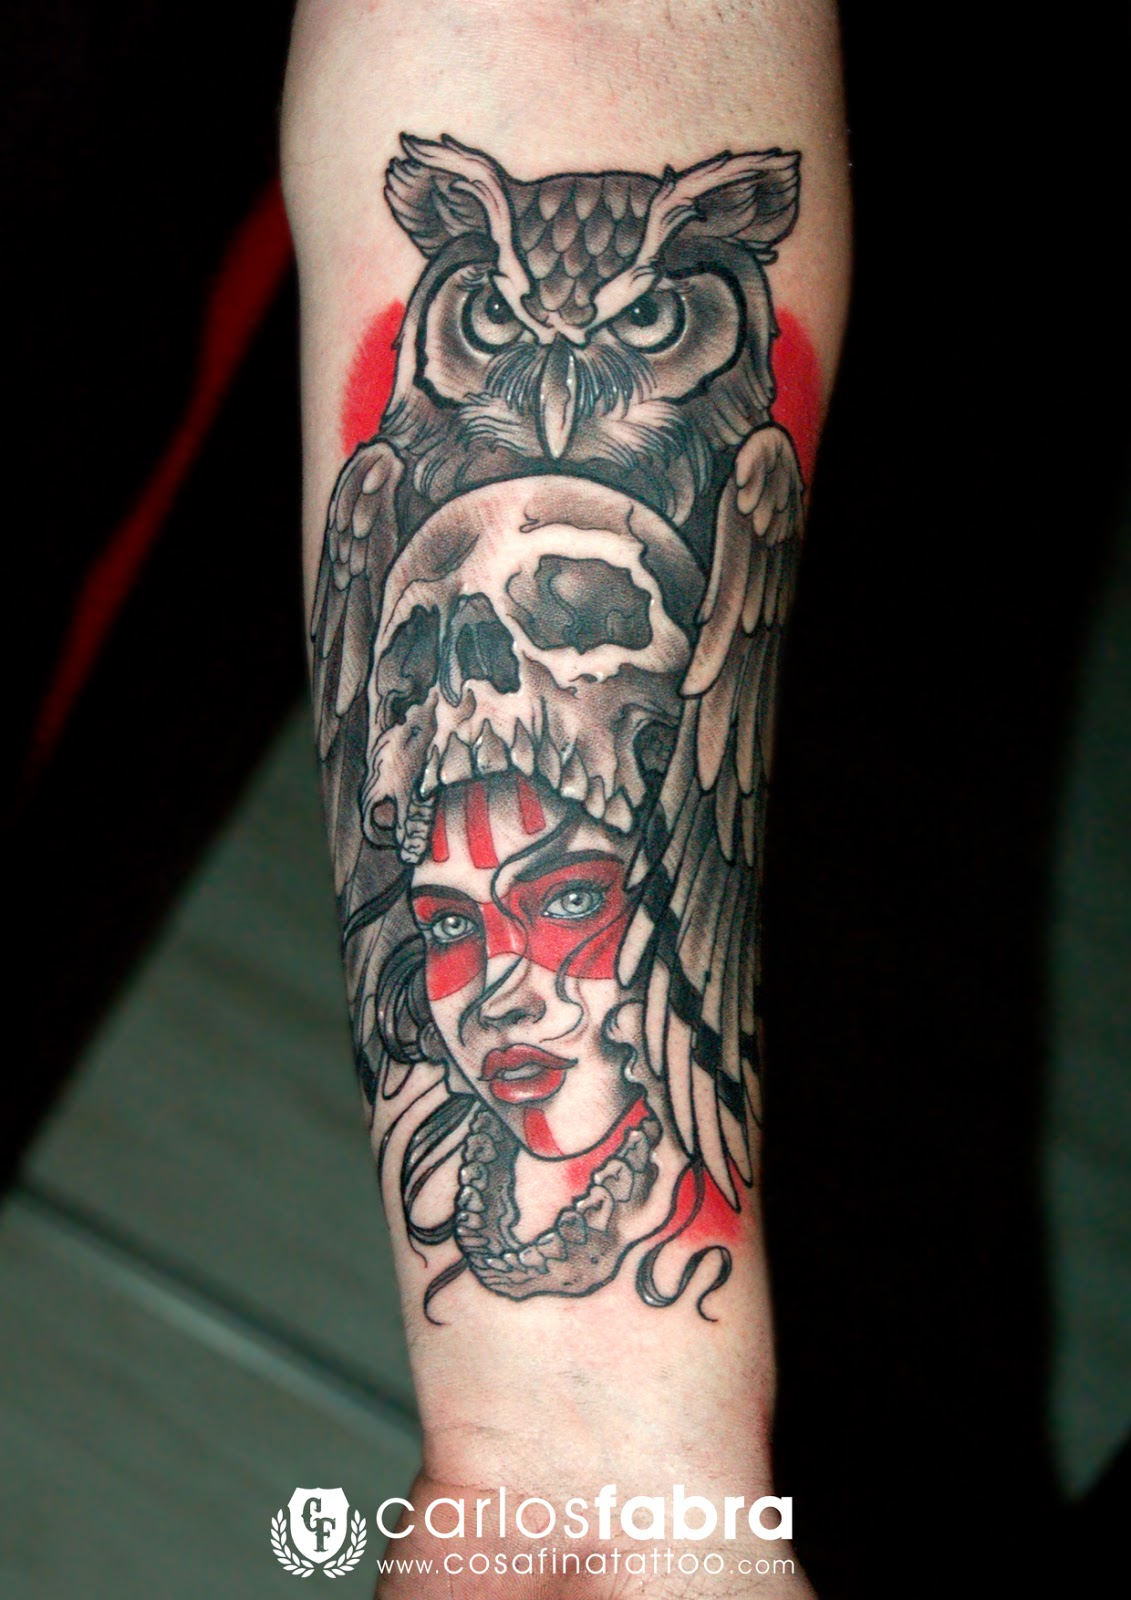 Cosafina Tattoo Carlos Art Studio Tatuaje Neotradicional -4548